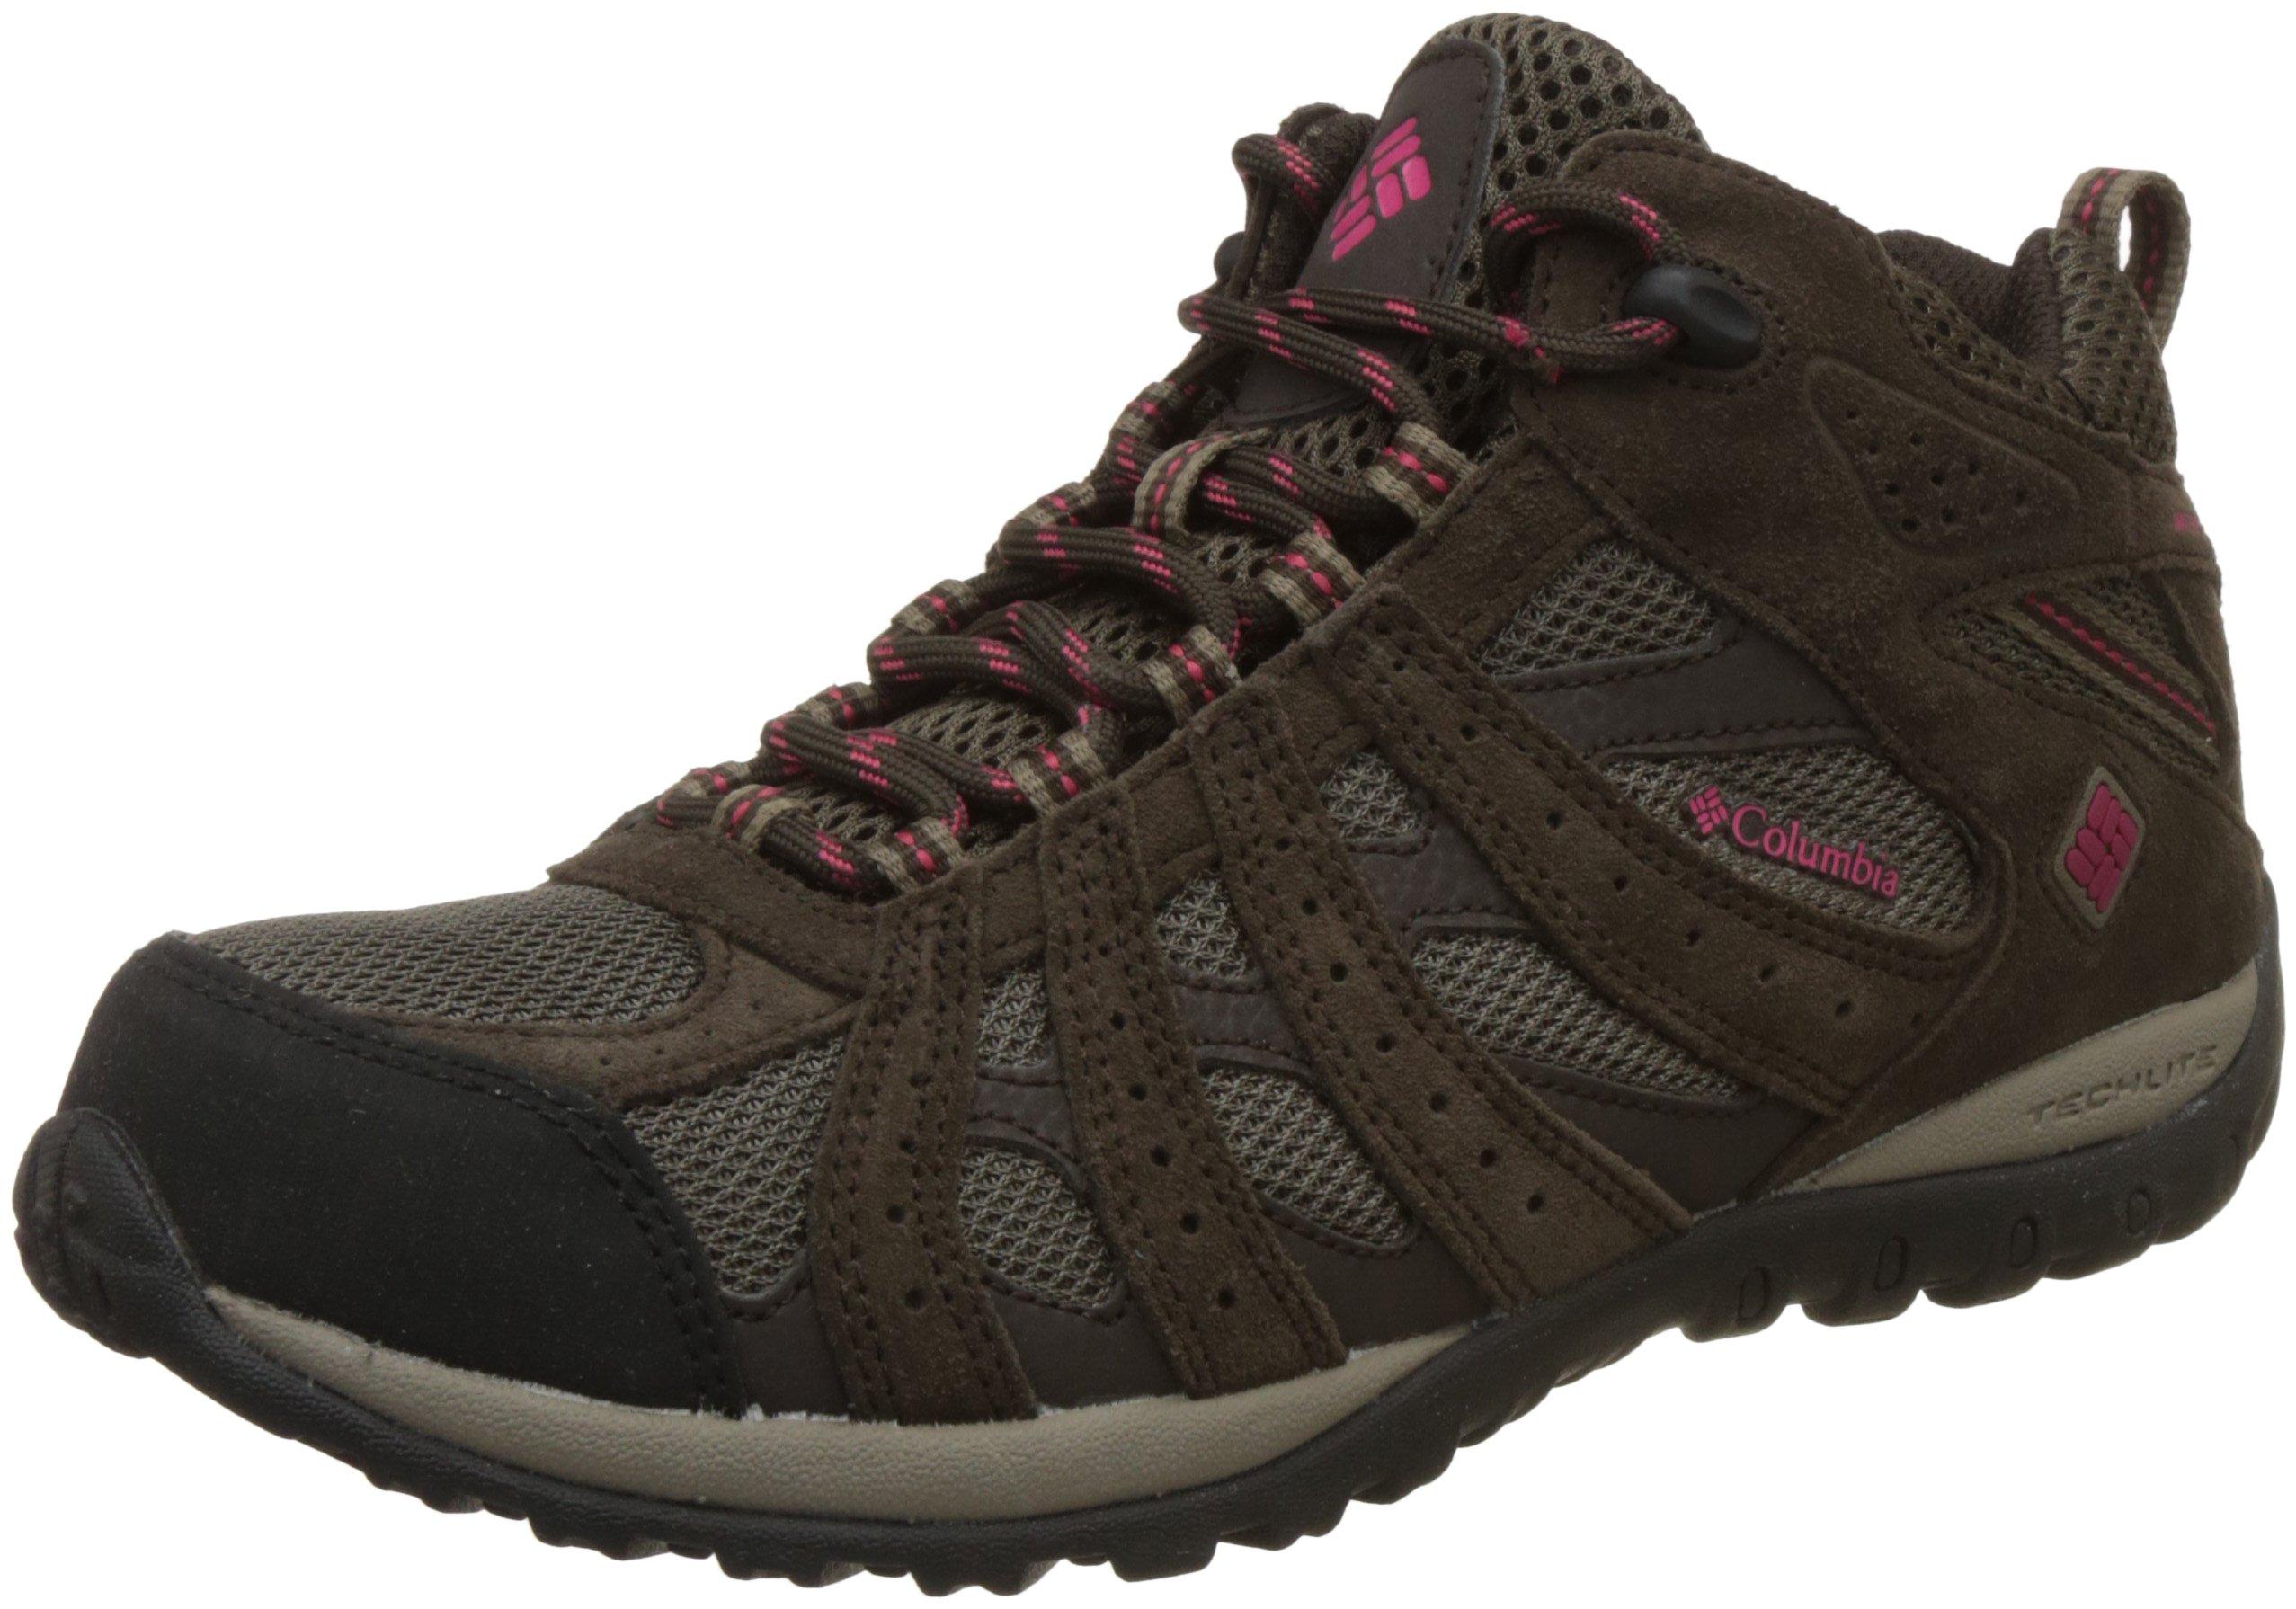 Columbia Women's Redmond Mid Waterproof Trail Shoe, Mud/Red Orchid, 10 M US